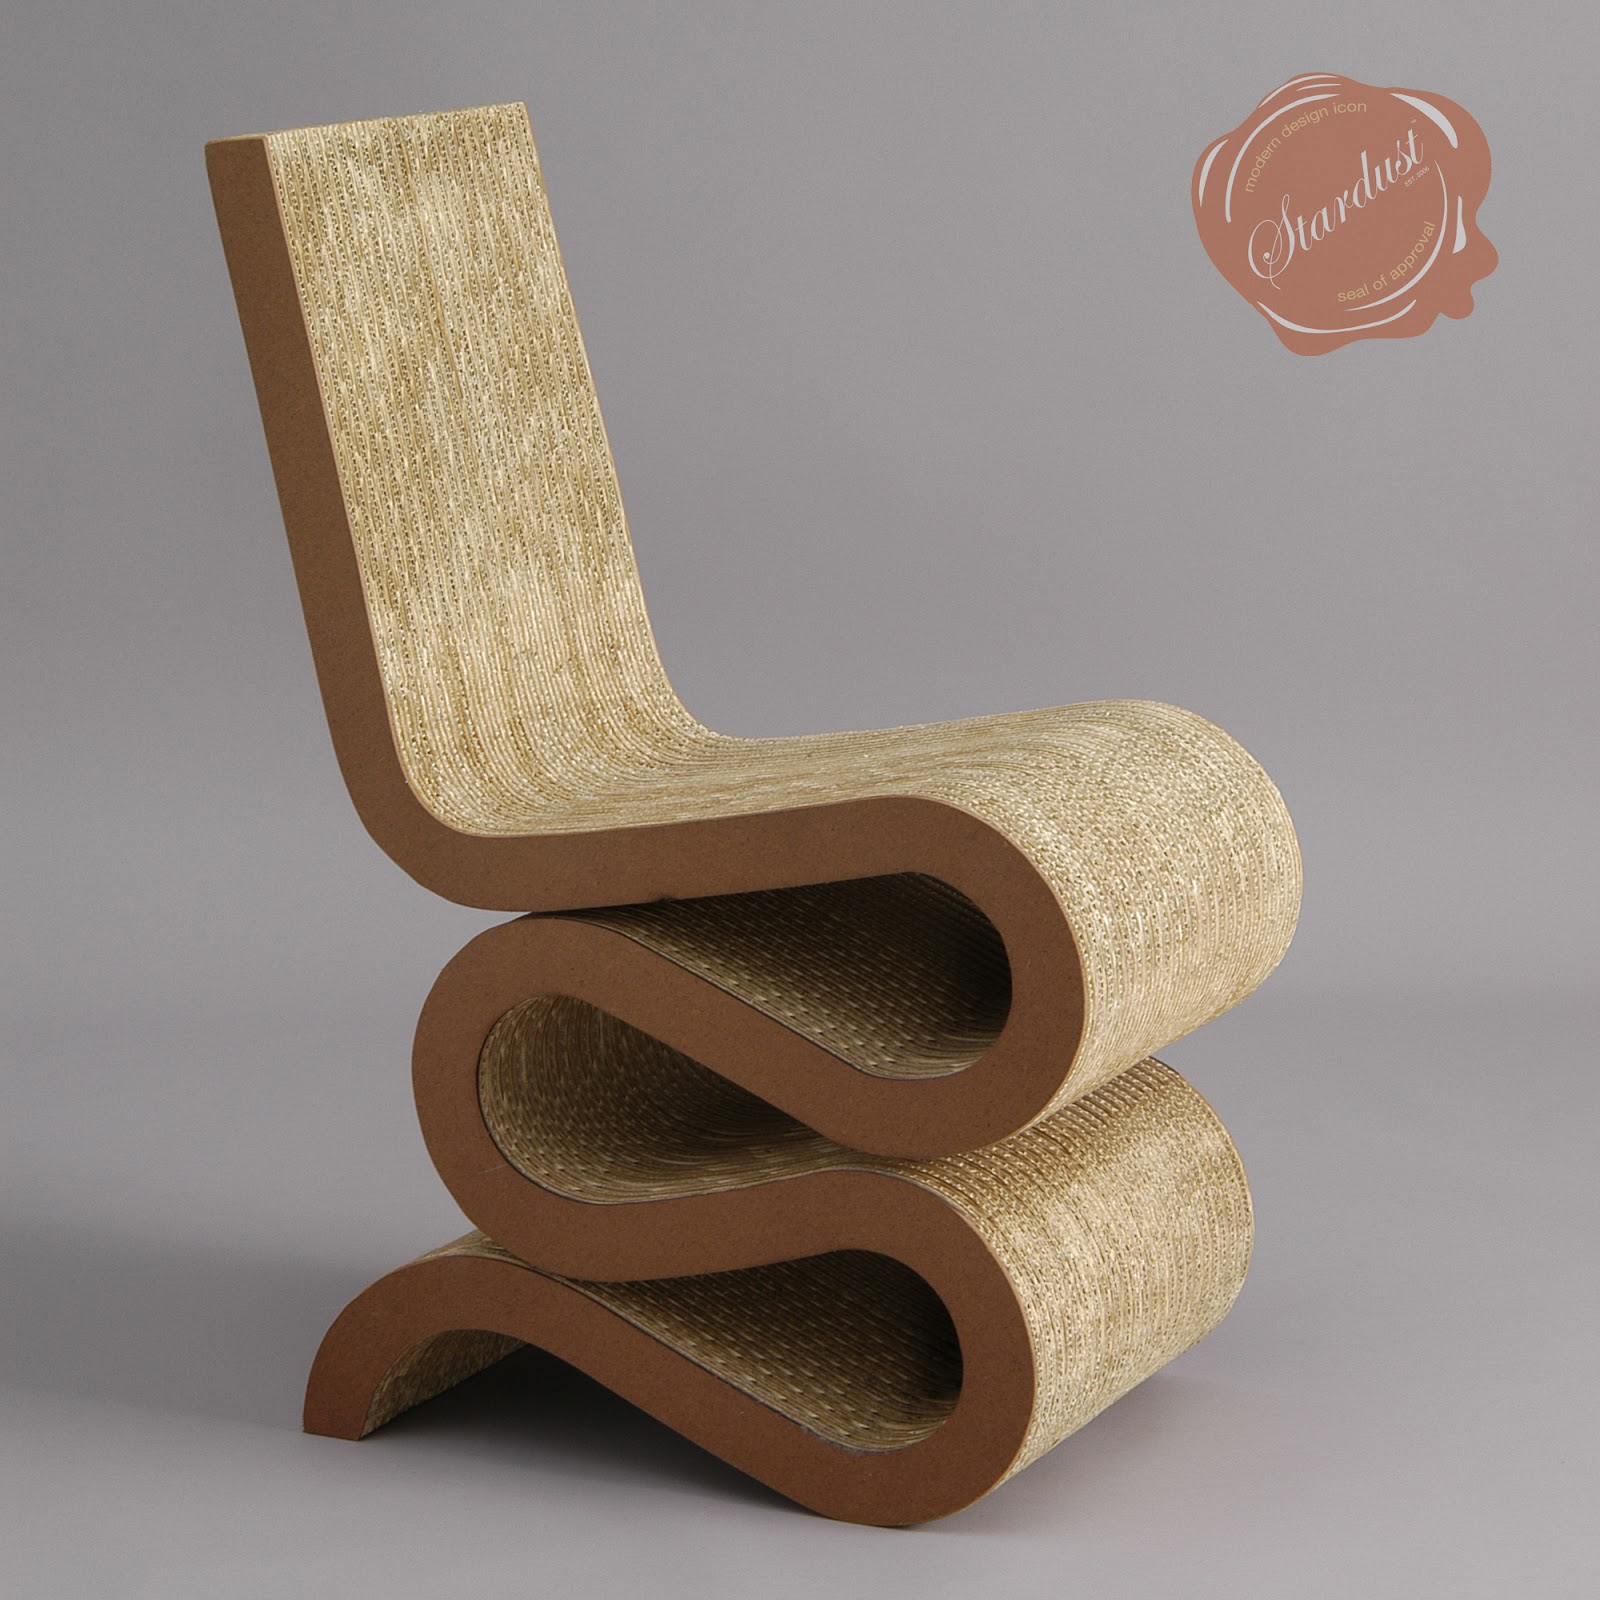 frank gehry chair patio glider chairs canada wiggle cardboard hardwood vitra